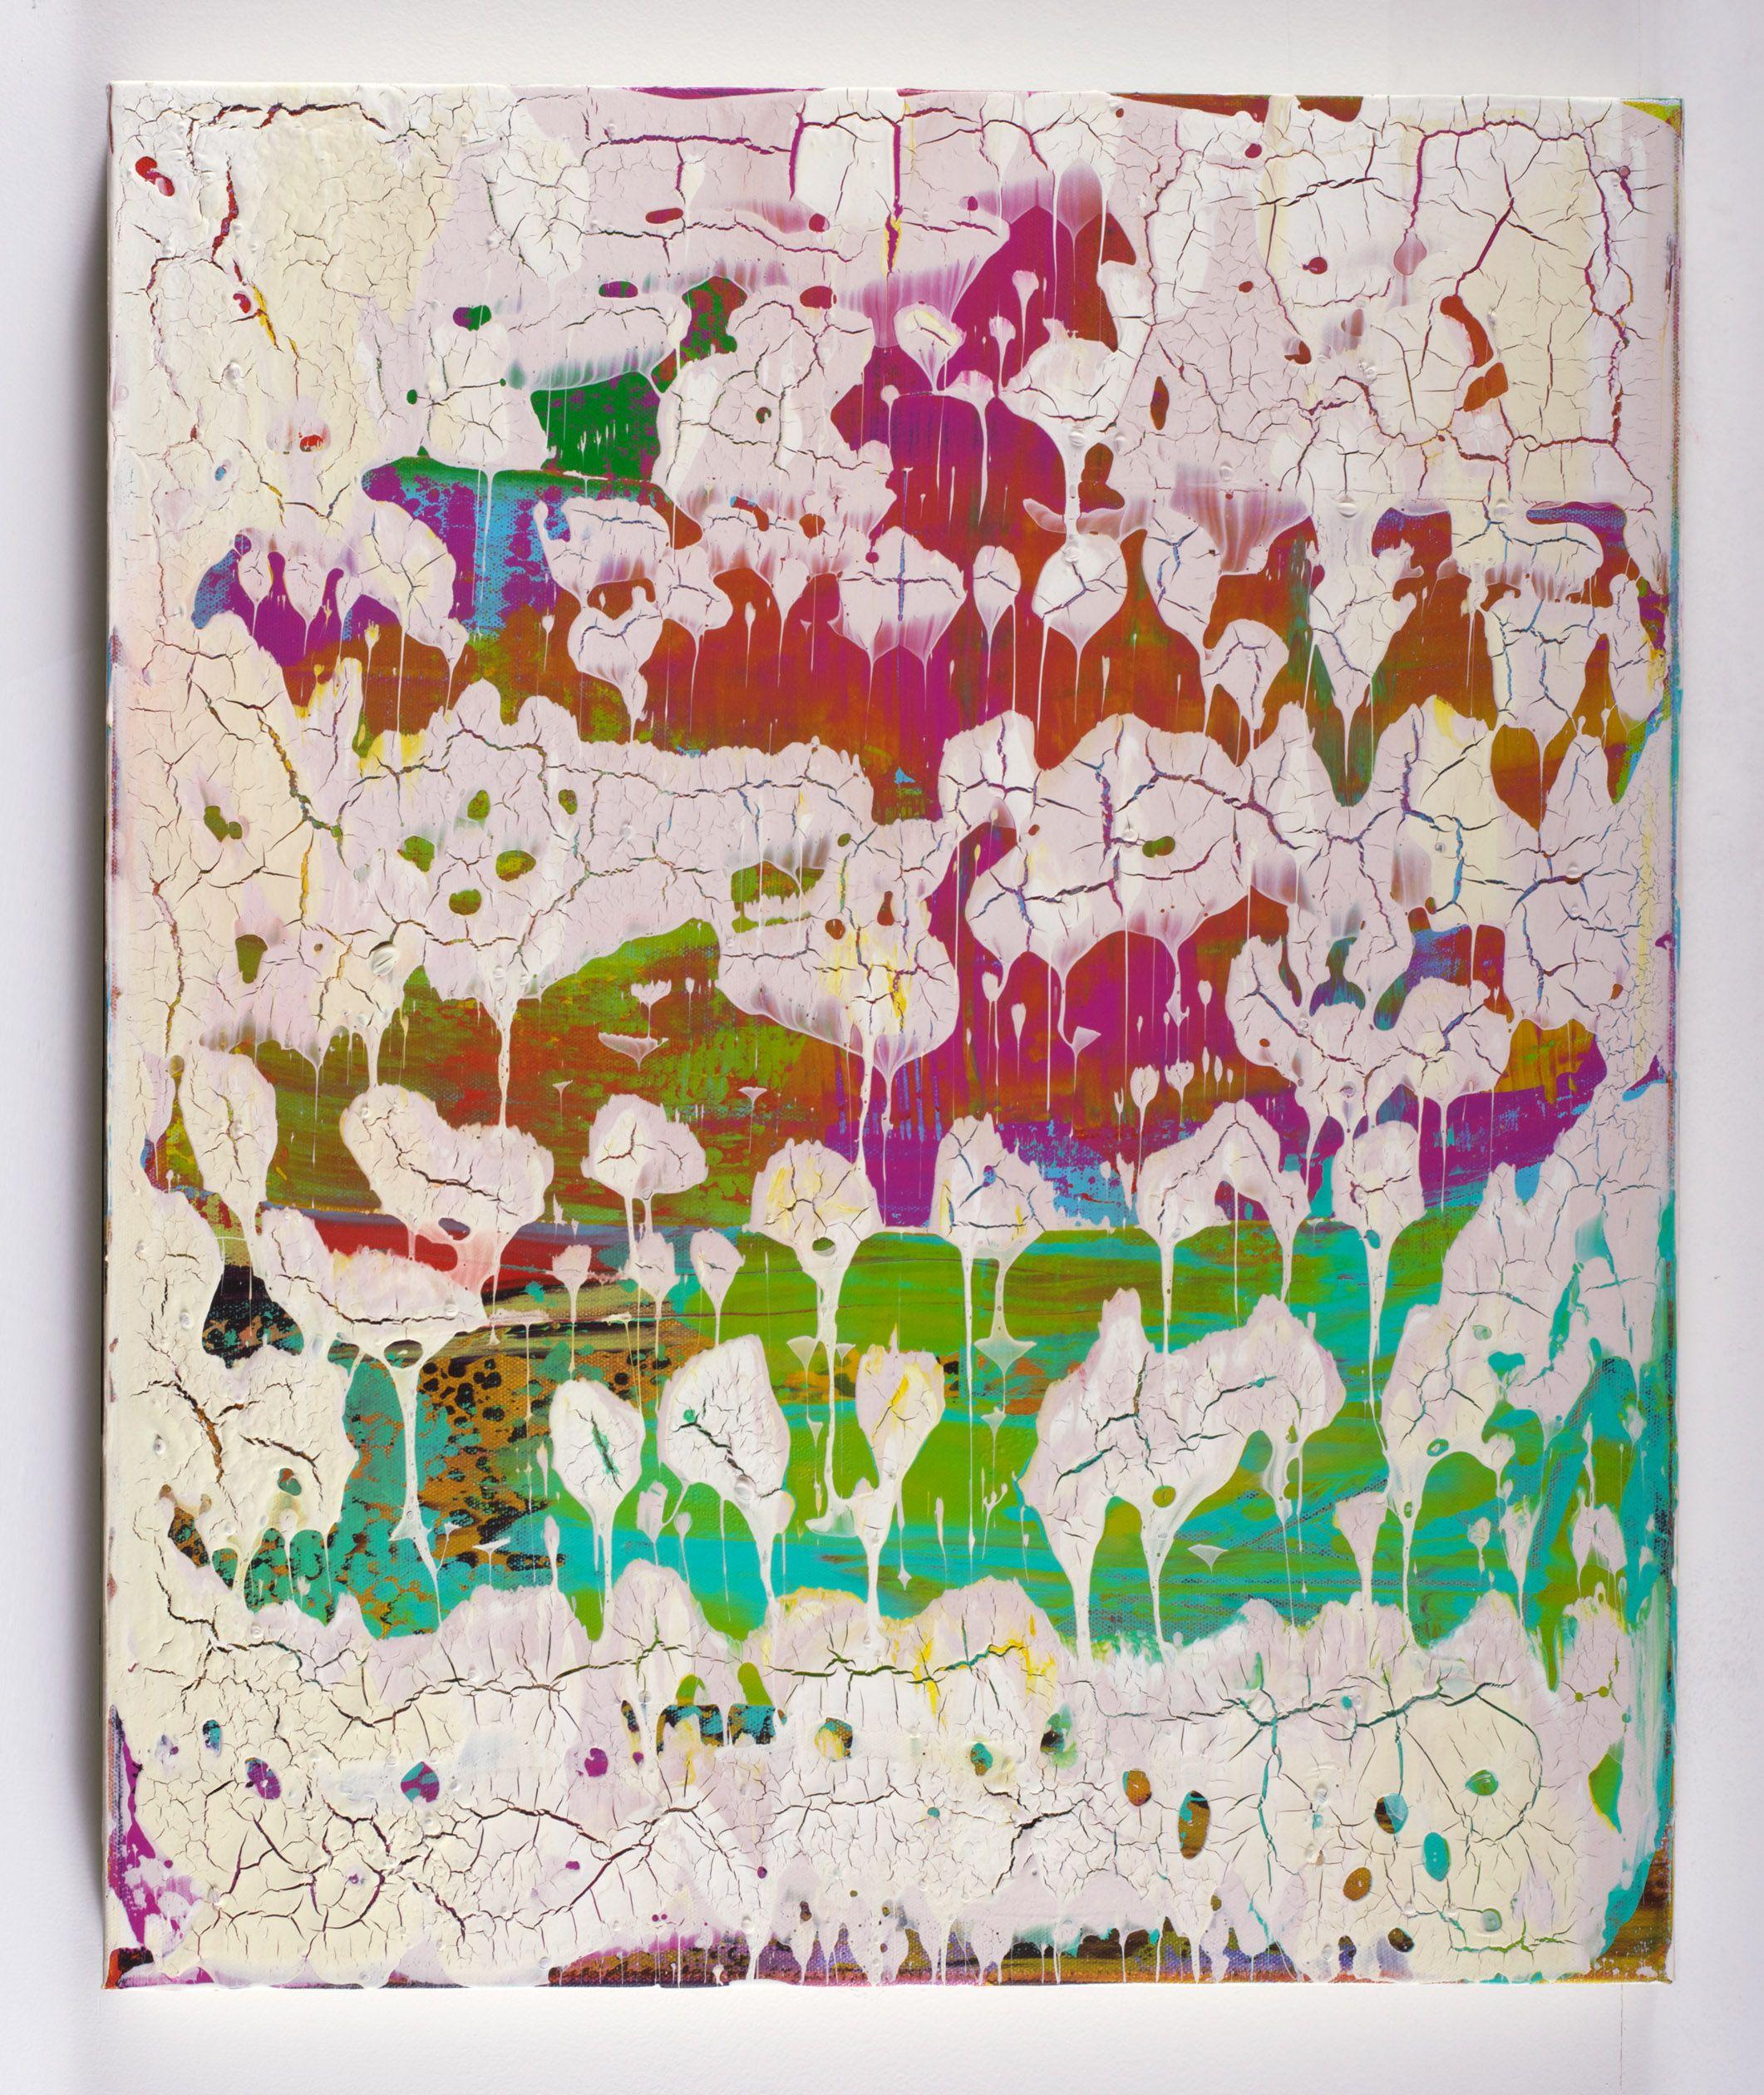 Stingrays 20x24 Acrylic on canvas by Chad Mars